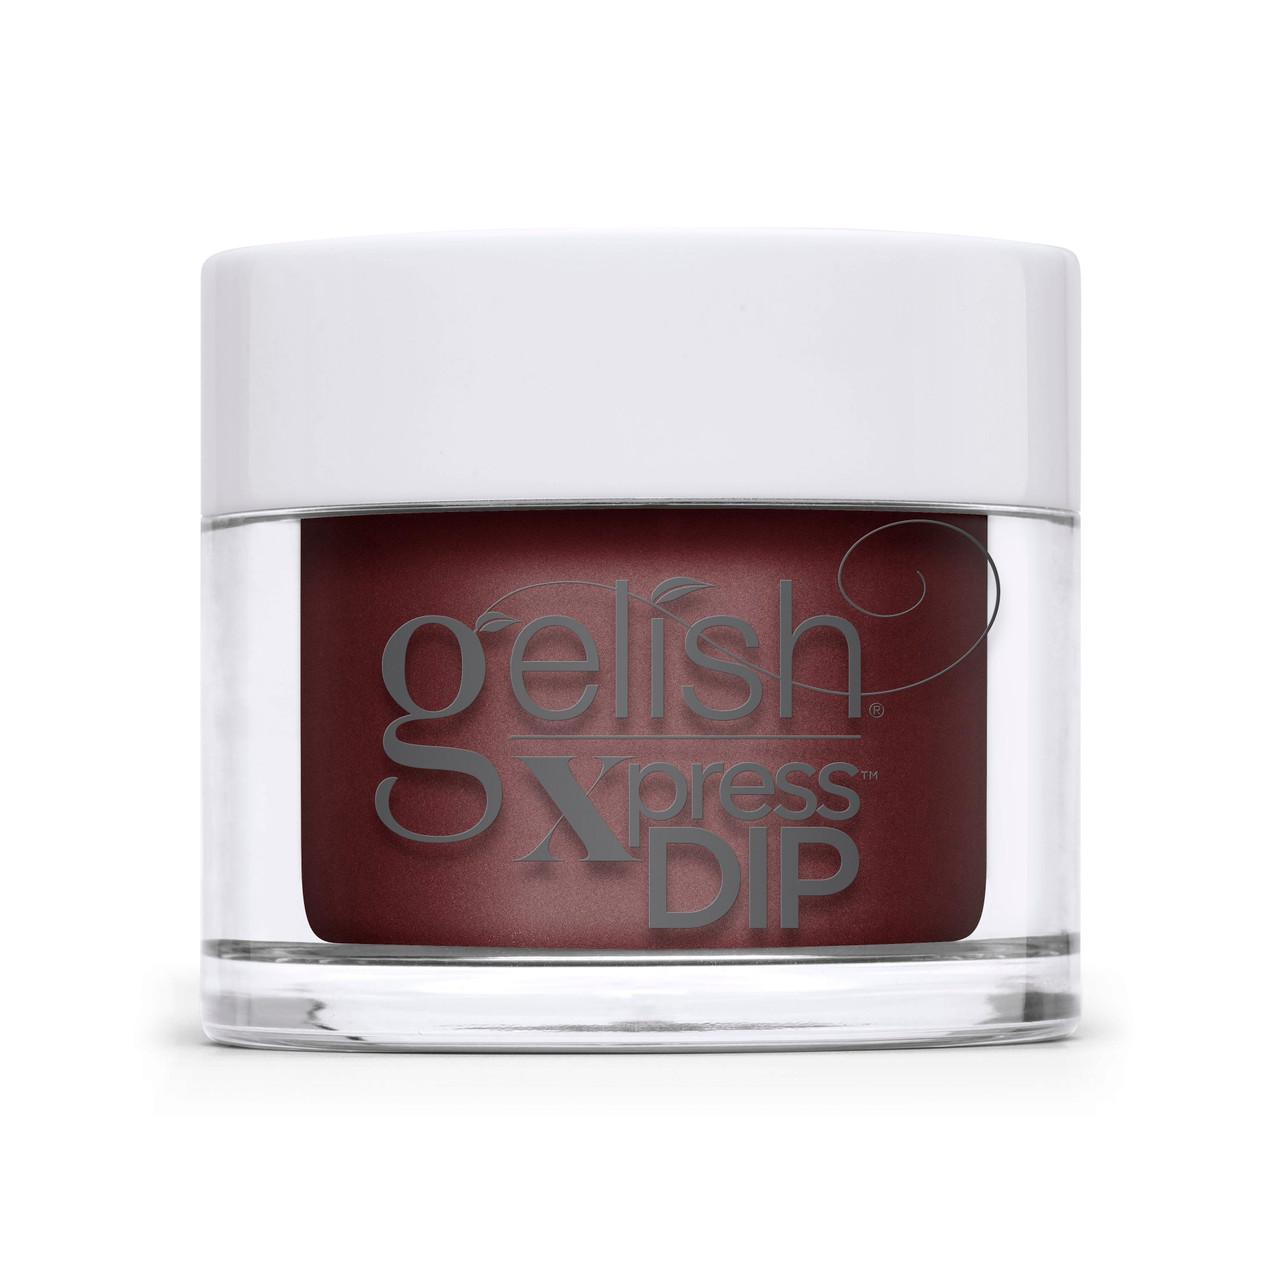 "Gelish Xpress Dip ""Uncharted Territory"" - Garnet Crème - 43g | 1.5 oz."